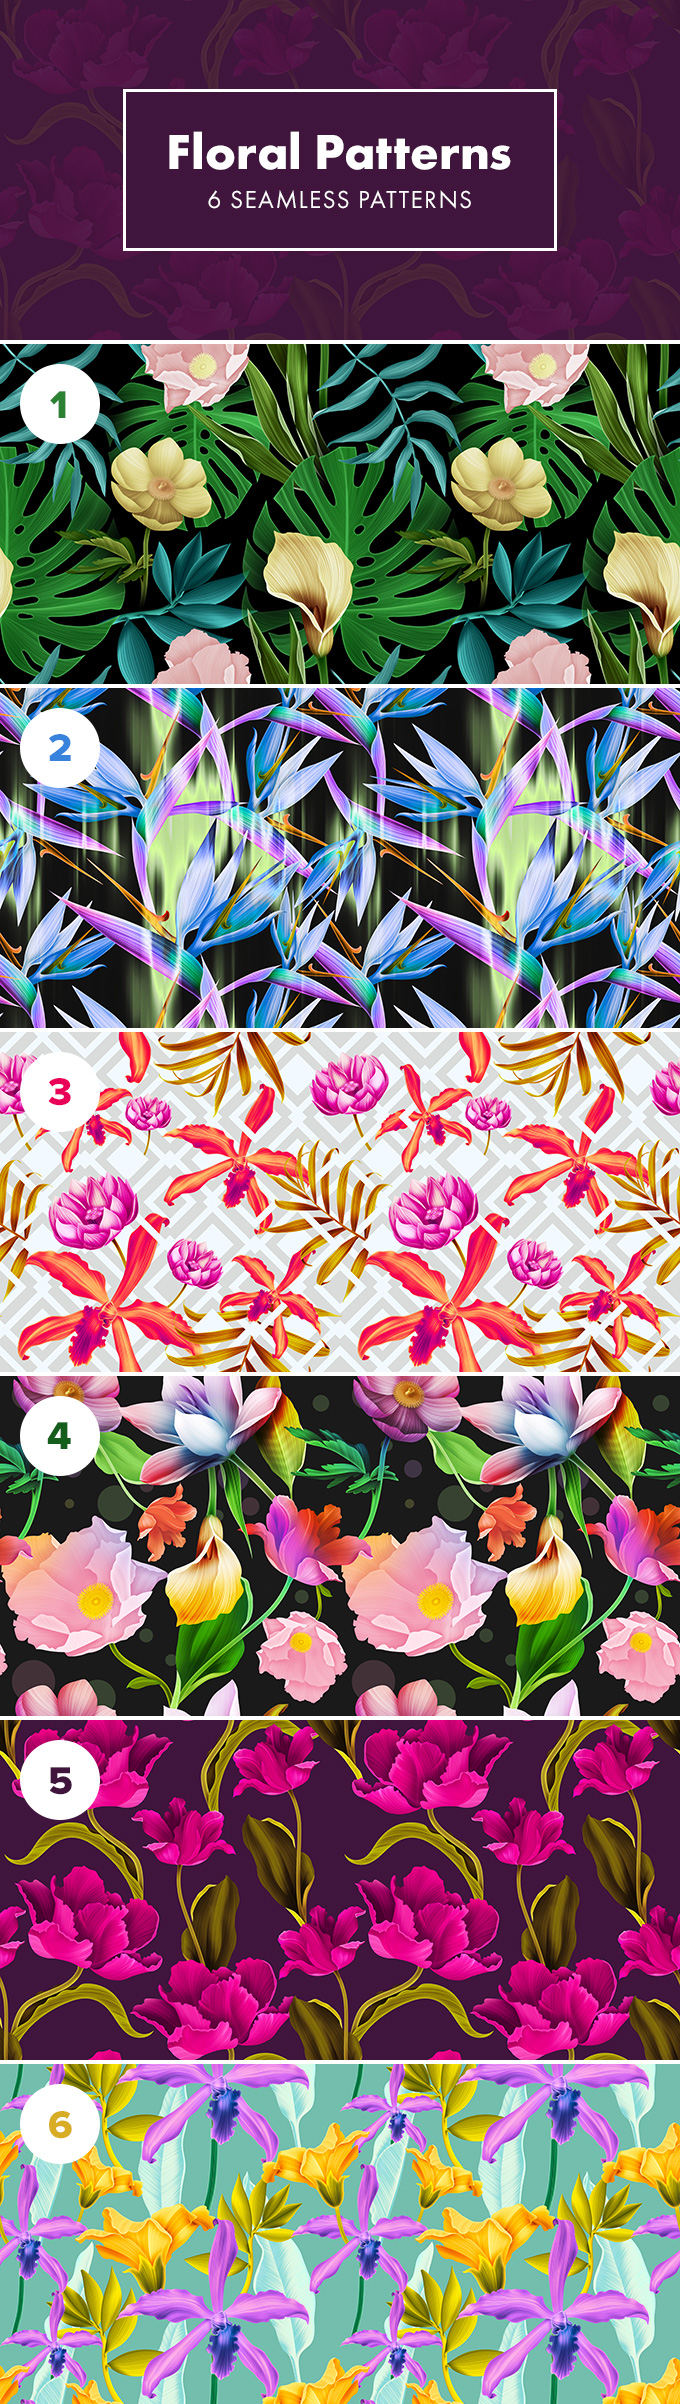 seamless floral patterns freebie